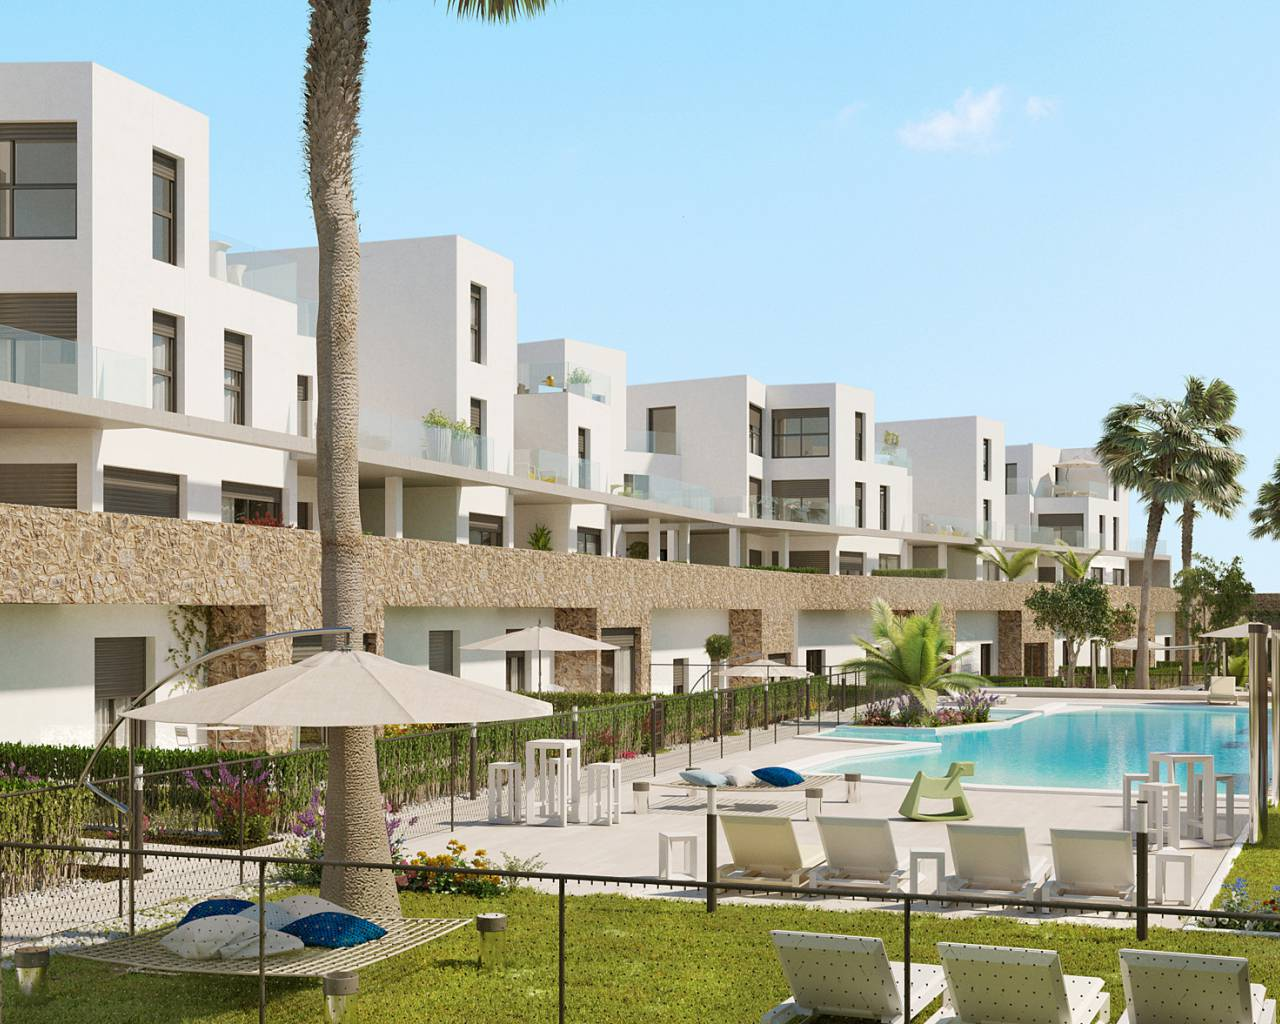 nieuwbouw-appartement-orihuela-costa-villamartin-golf_678_xl